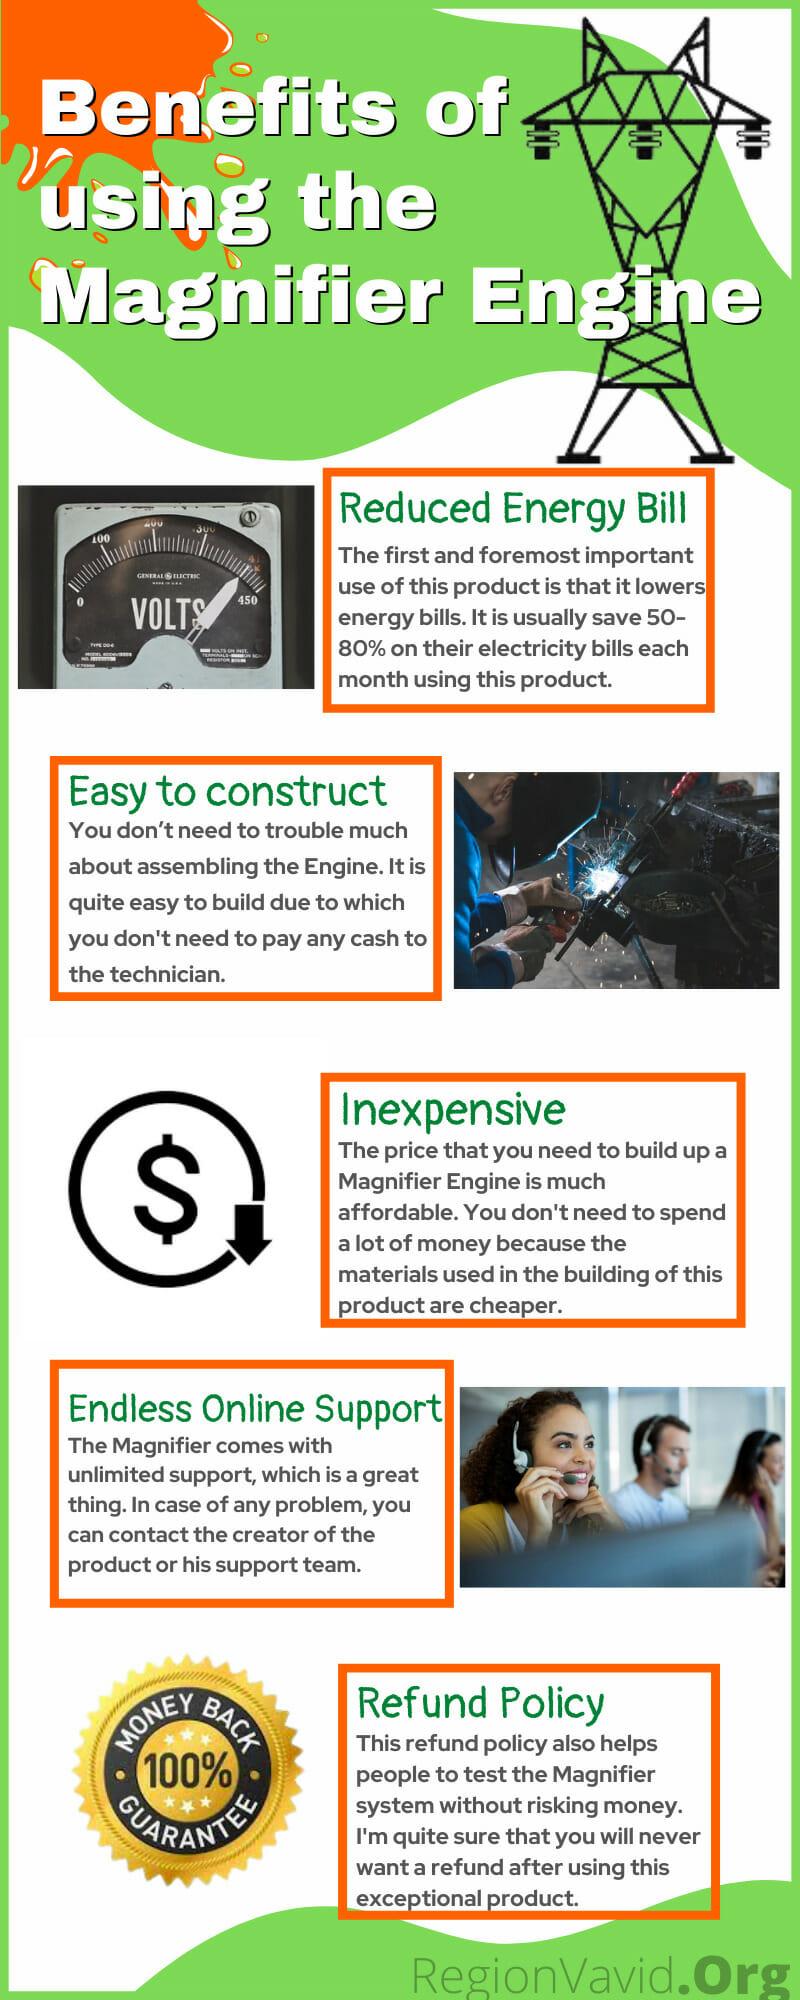 Magnifier Engine Benefits